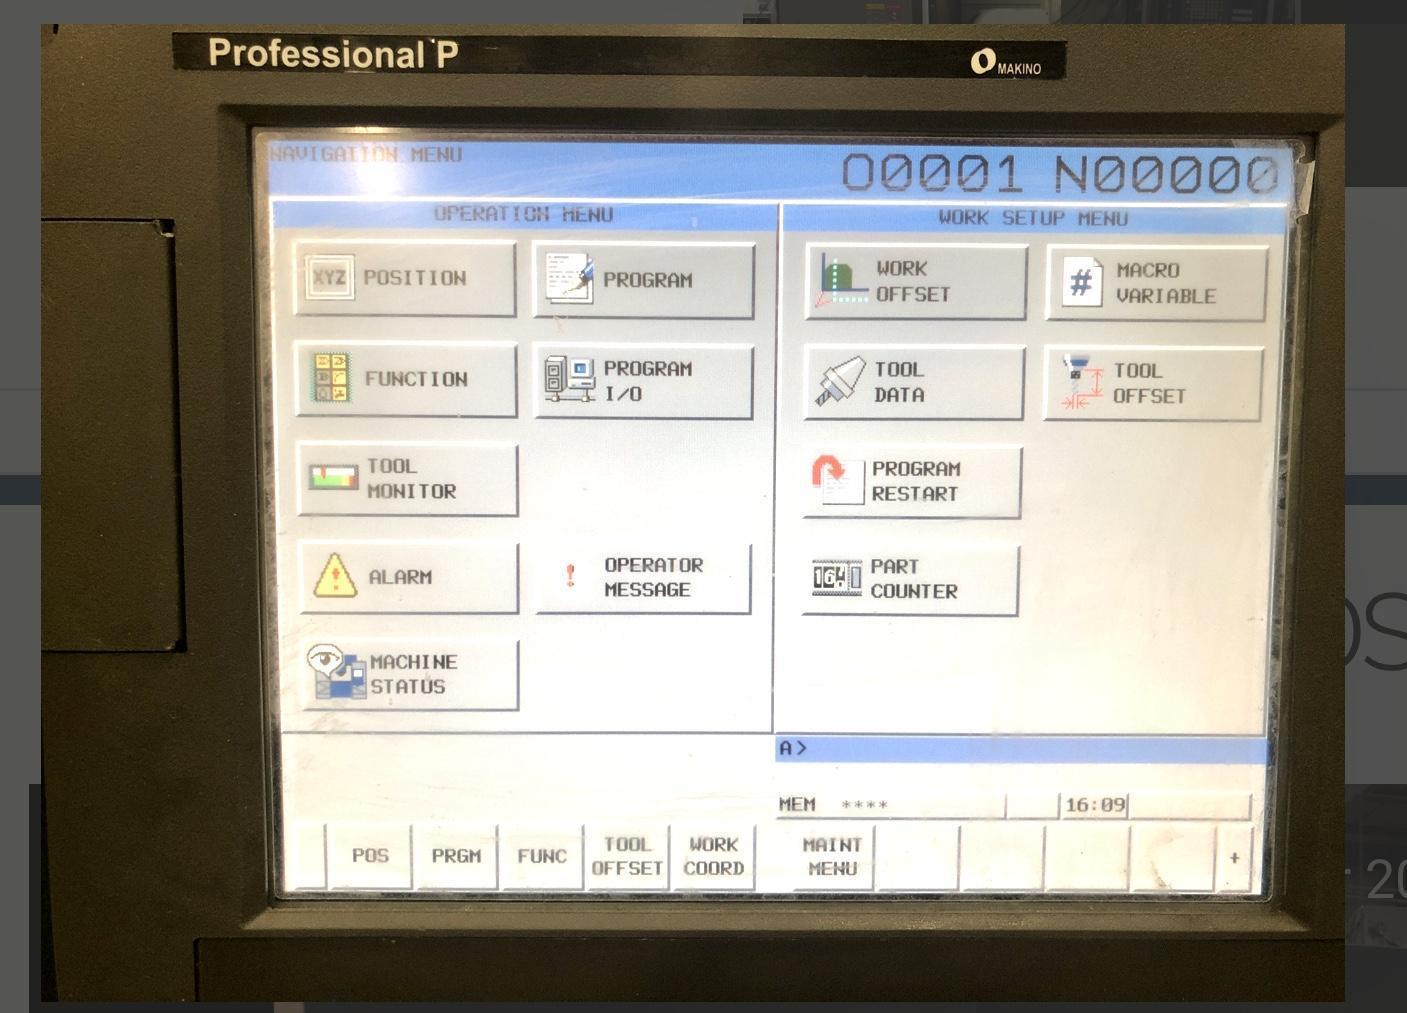 MAKINO PS95 - 5 Axis 2011